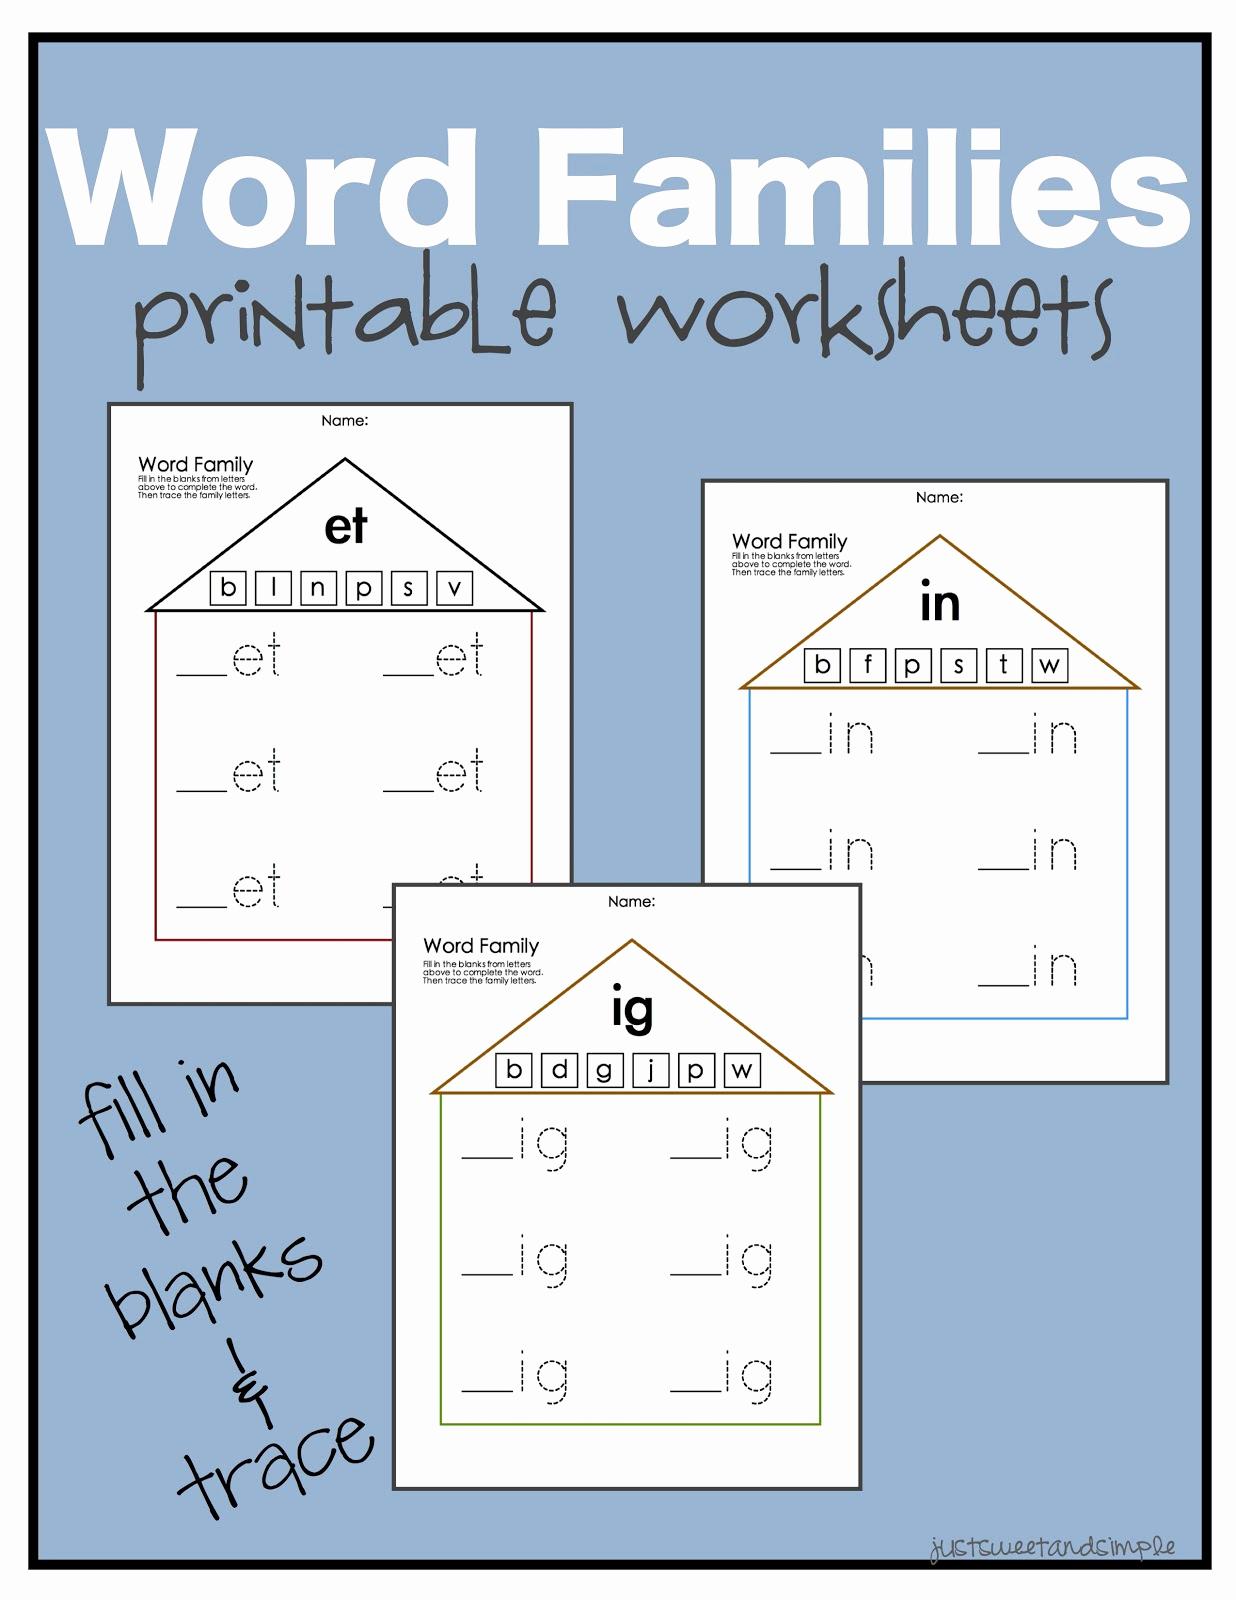 Word Family Worksheet Kindergarten Inspirational Just Sweet and Simple Preschool Practice Word Family